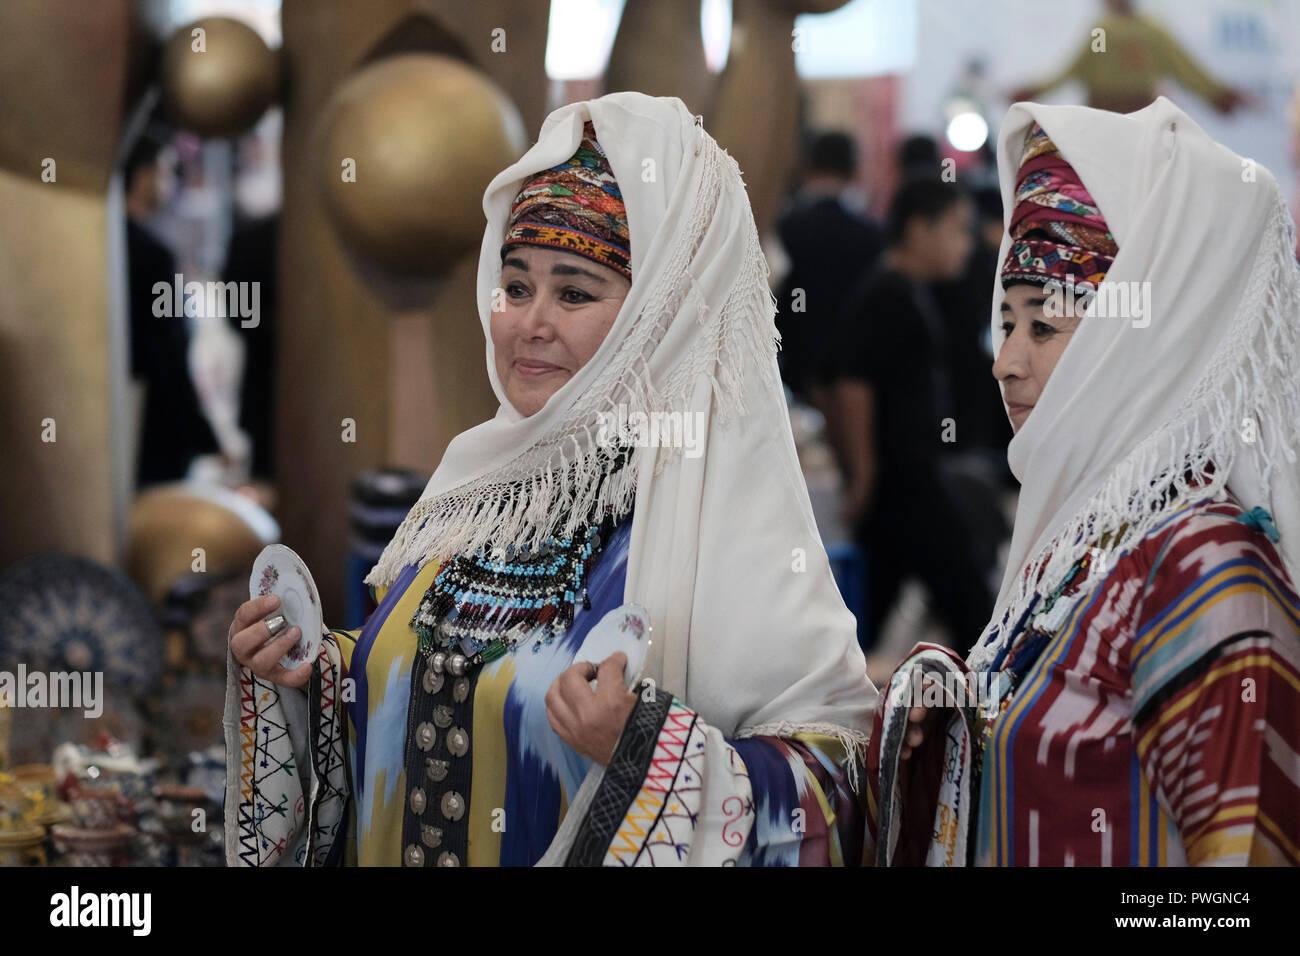 Bukharian Stock Photos & Bukharian Stock Images - Alamy